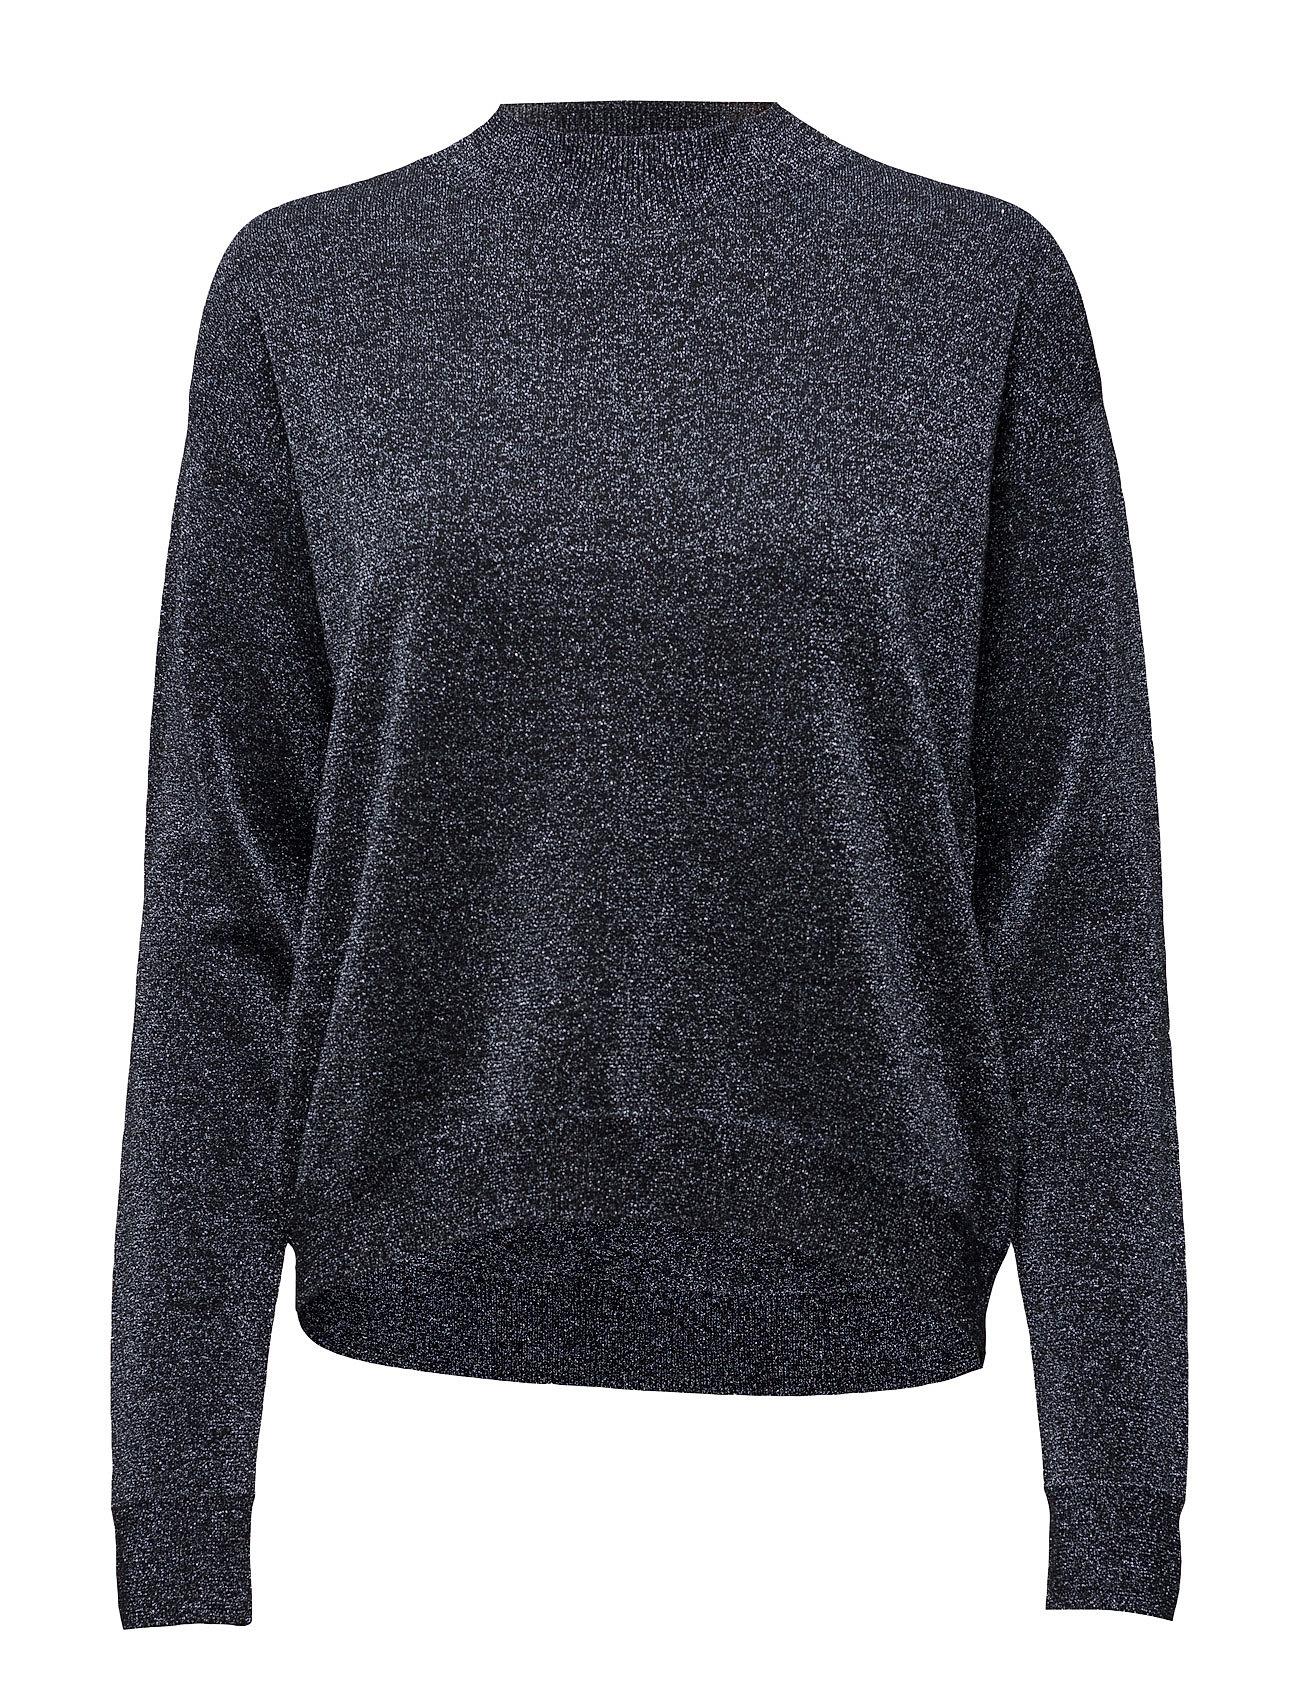 Funday BOSS Sweatshirts til Damer i Open Blå